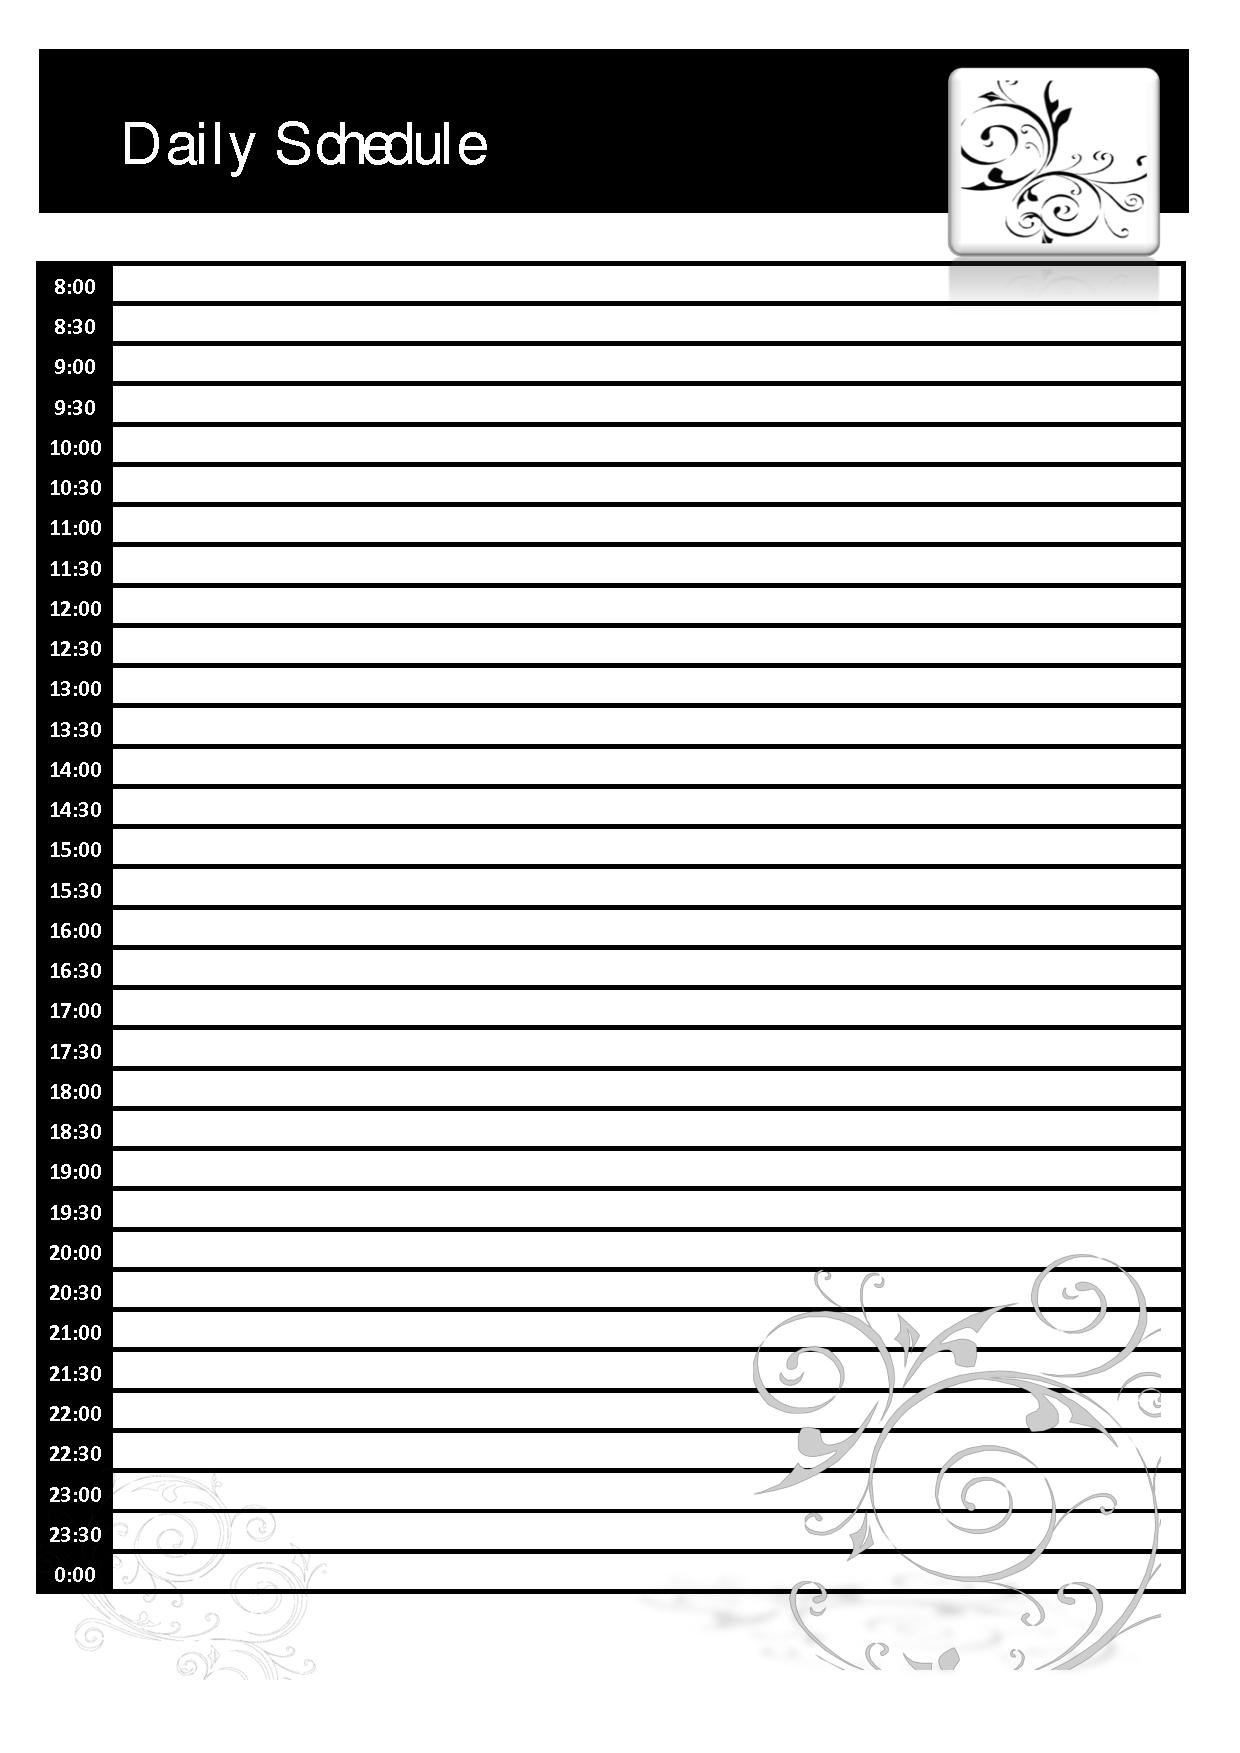 Daily Schedule Blank | Daily Agenda Calendar